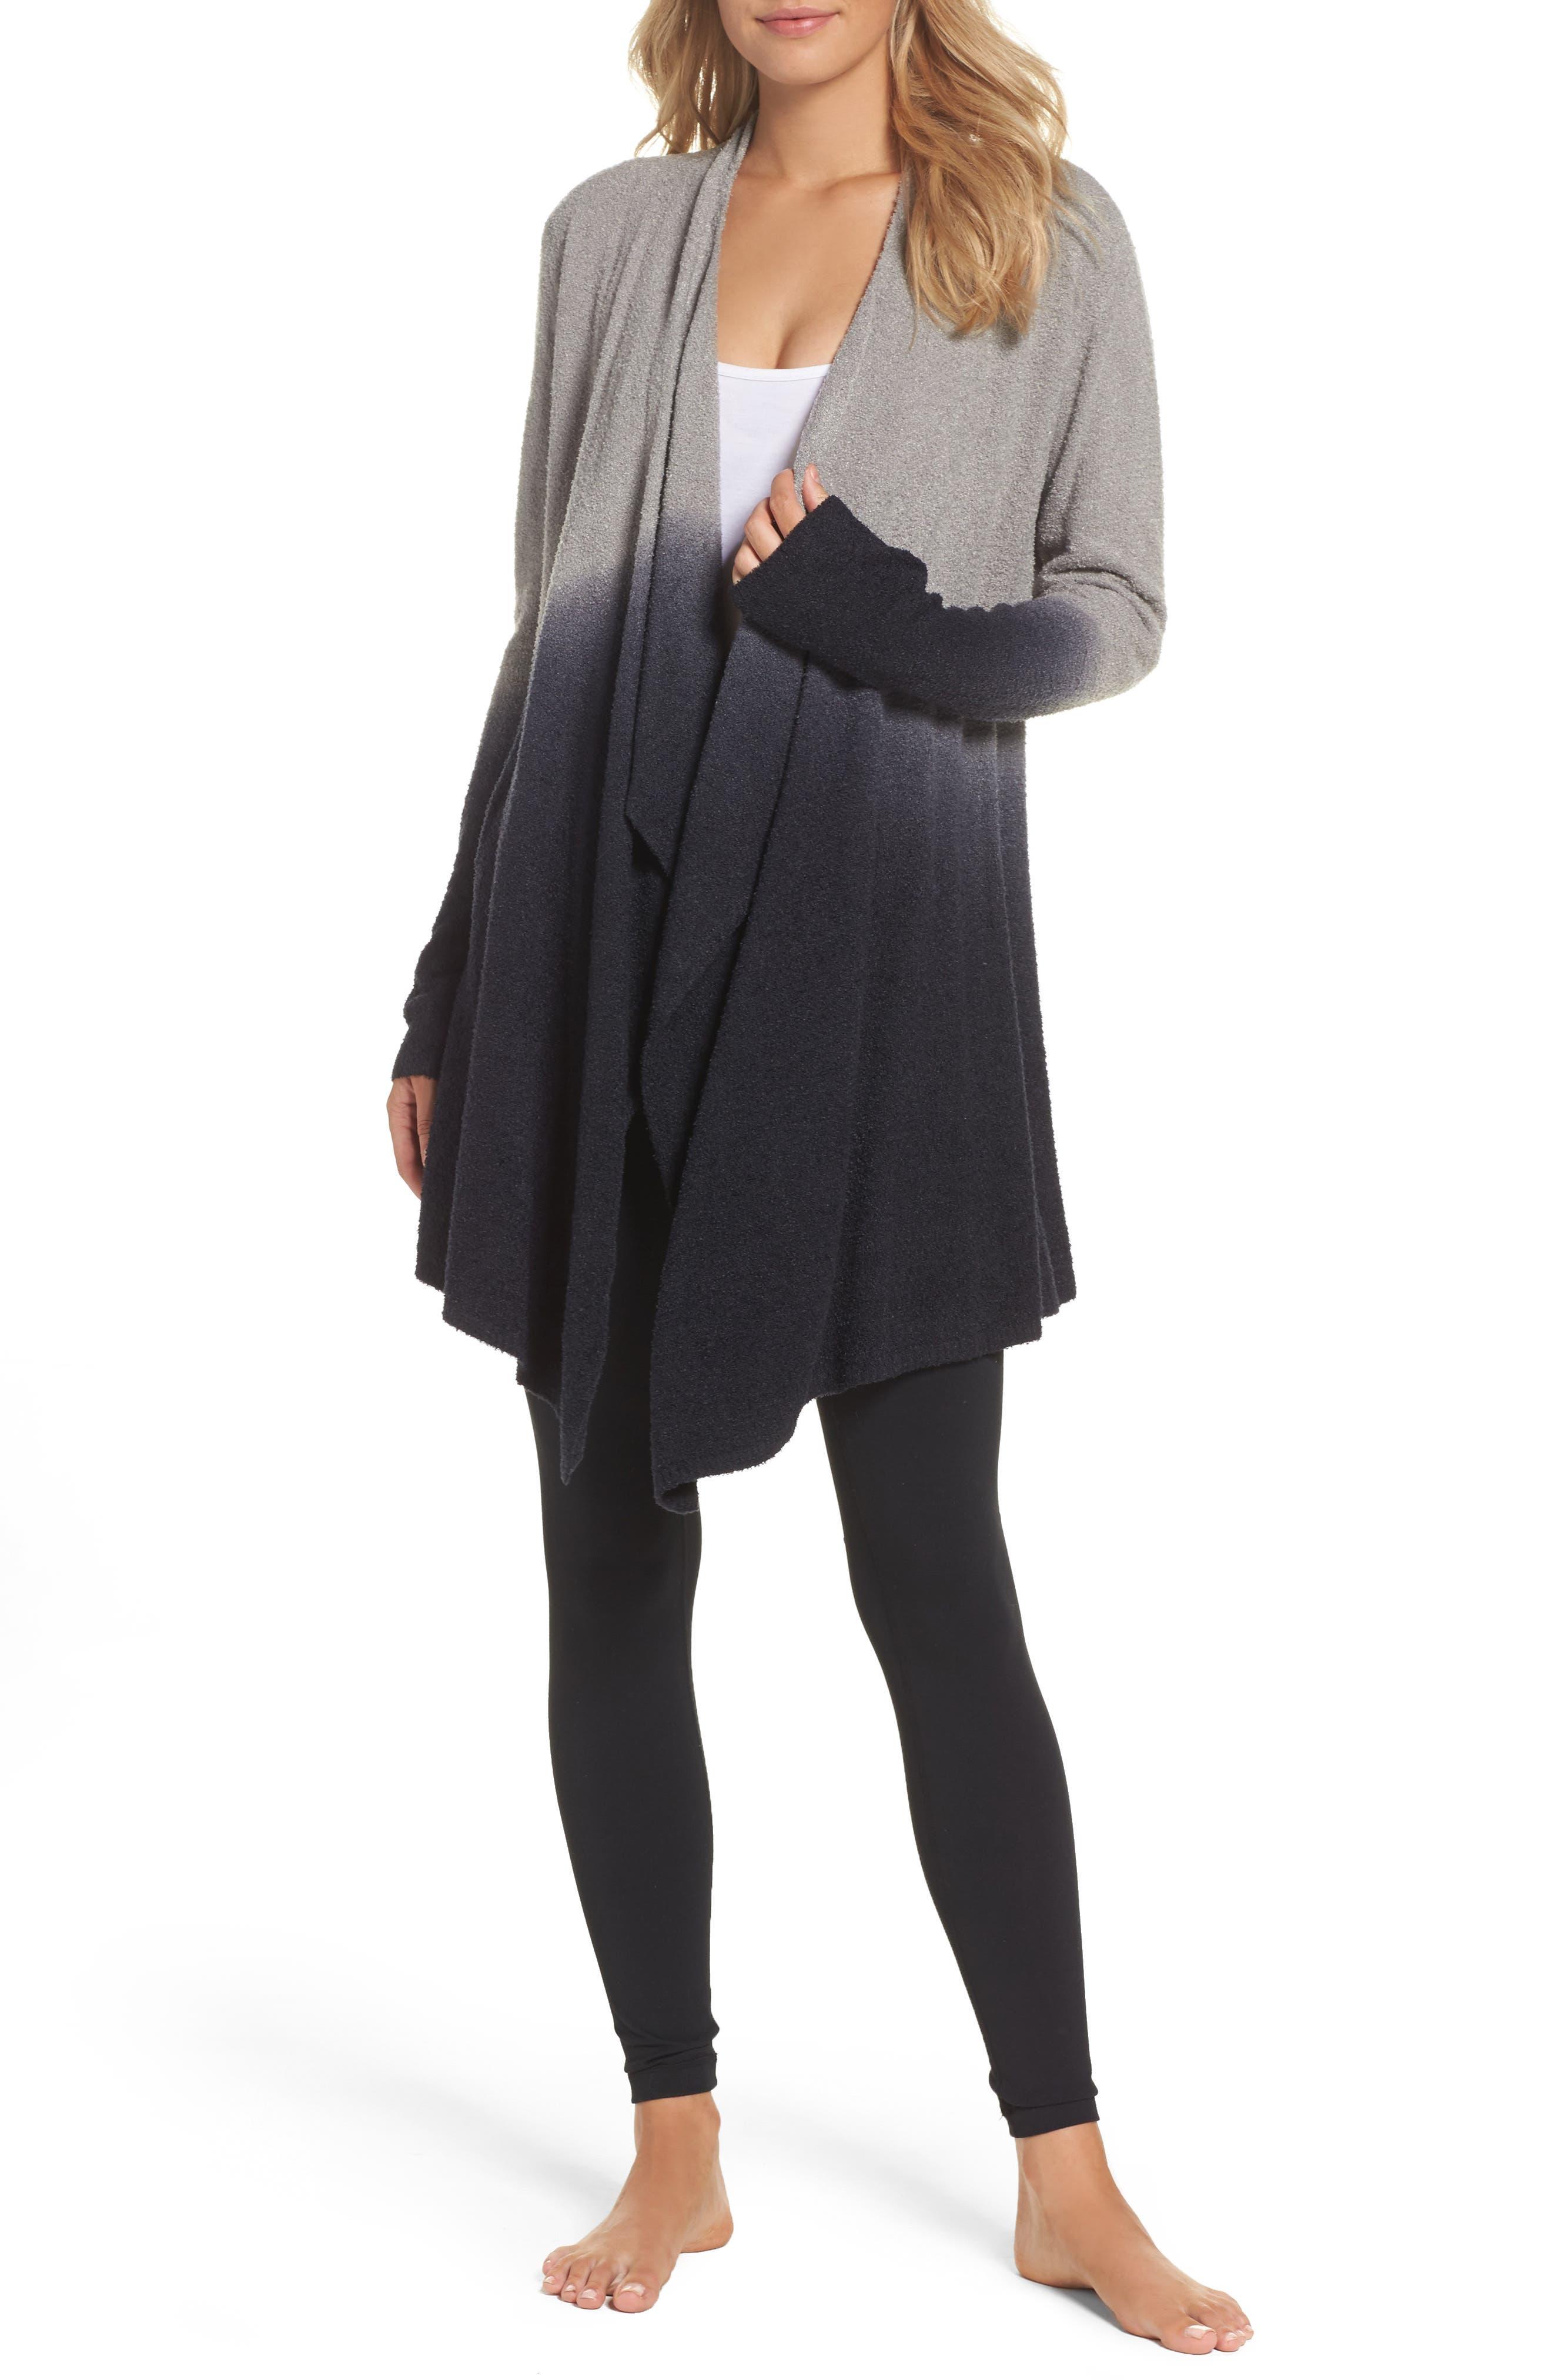 Alternate Image 1 Selected - Barefoot Dreams® CozyChic Lite® Calypso Wrap Cardigan (Nordstrom Exclusive)